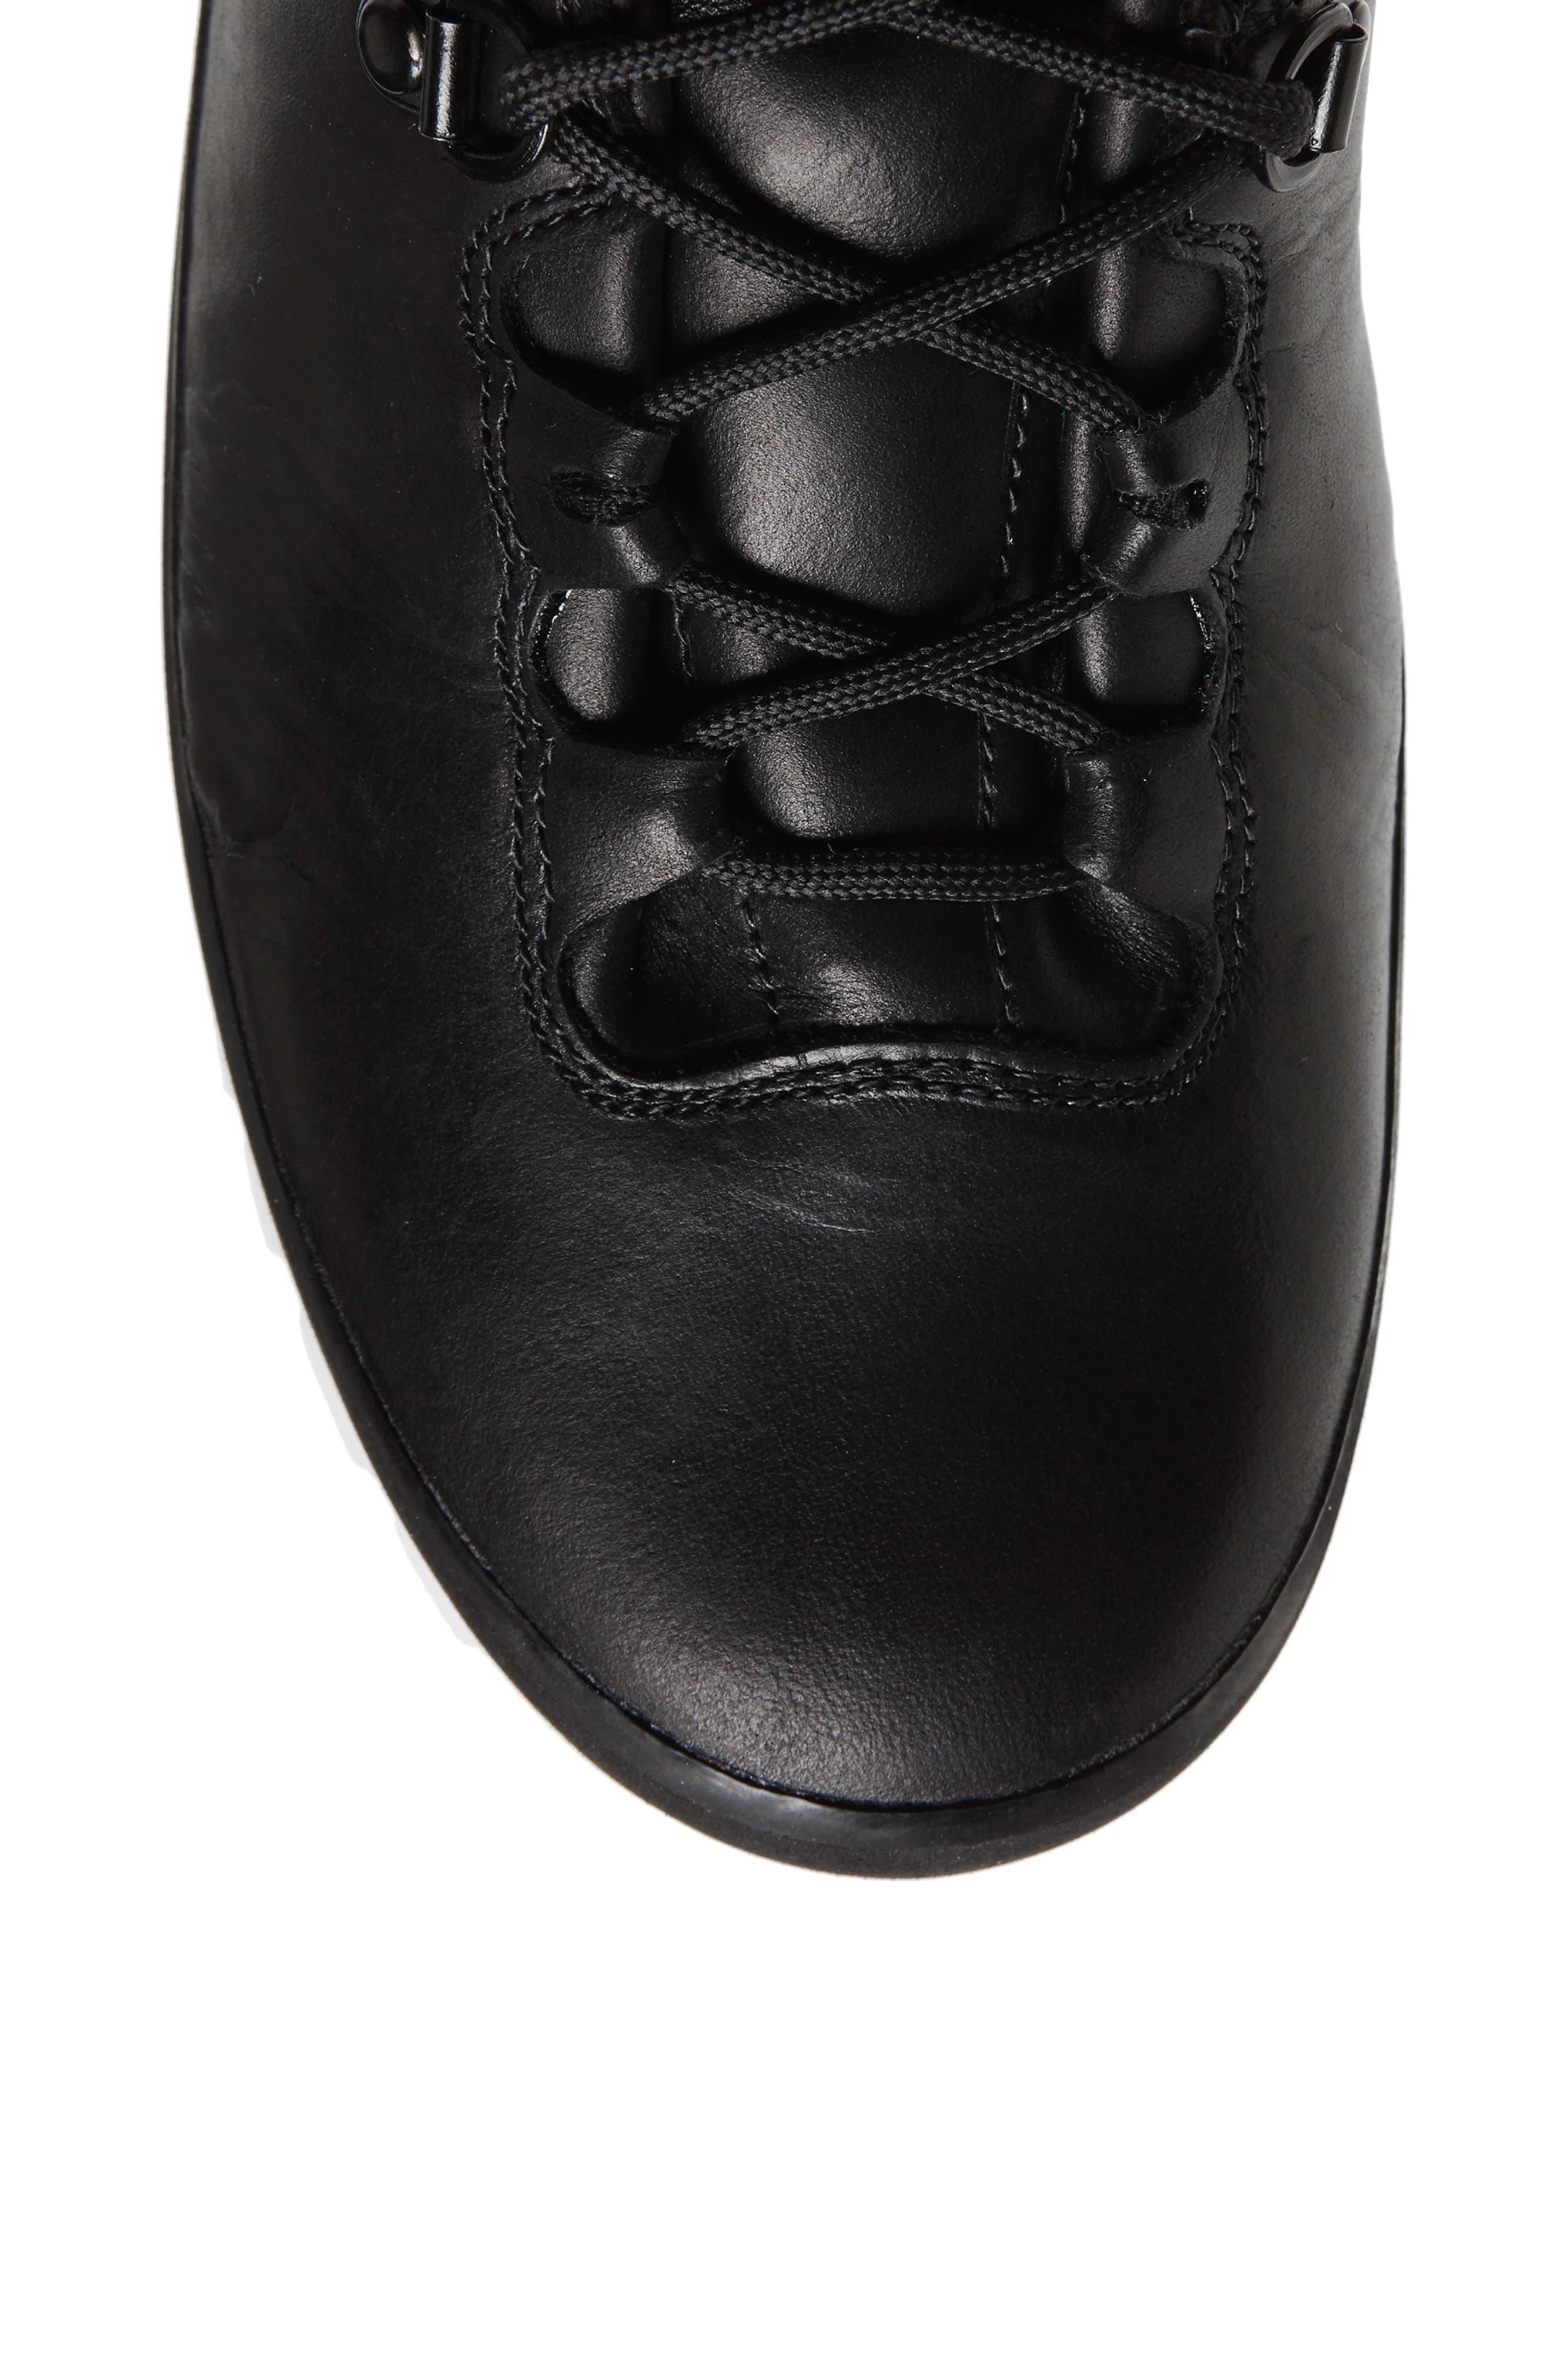 Cryos Hiker Boot,                             Alternate thumbnail 5, color,                             Tnf Black/ Tnf White